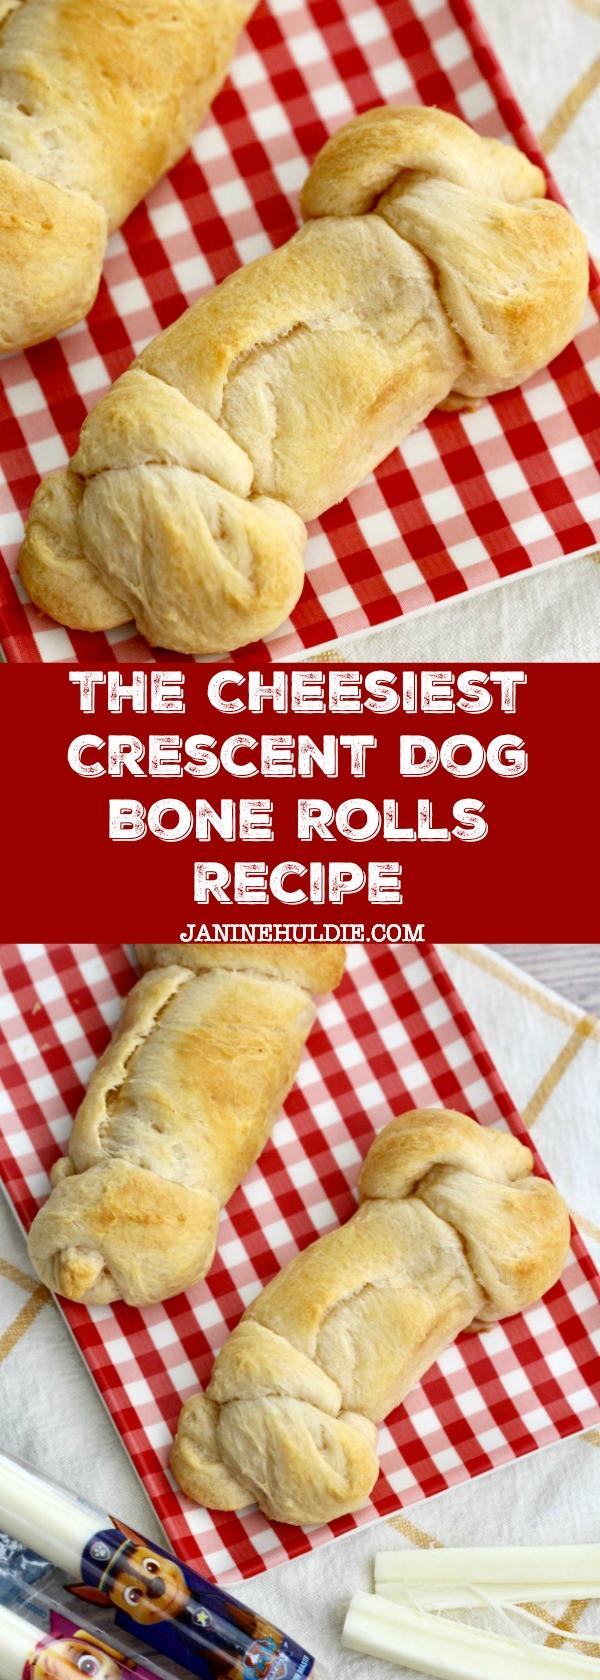 The Cheesiest Crescent Dog Bone Rolls Recipe